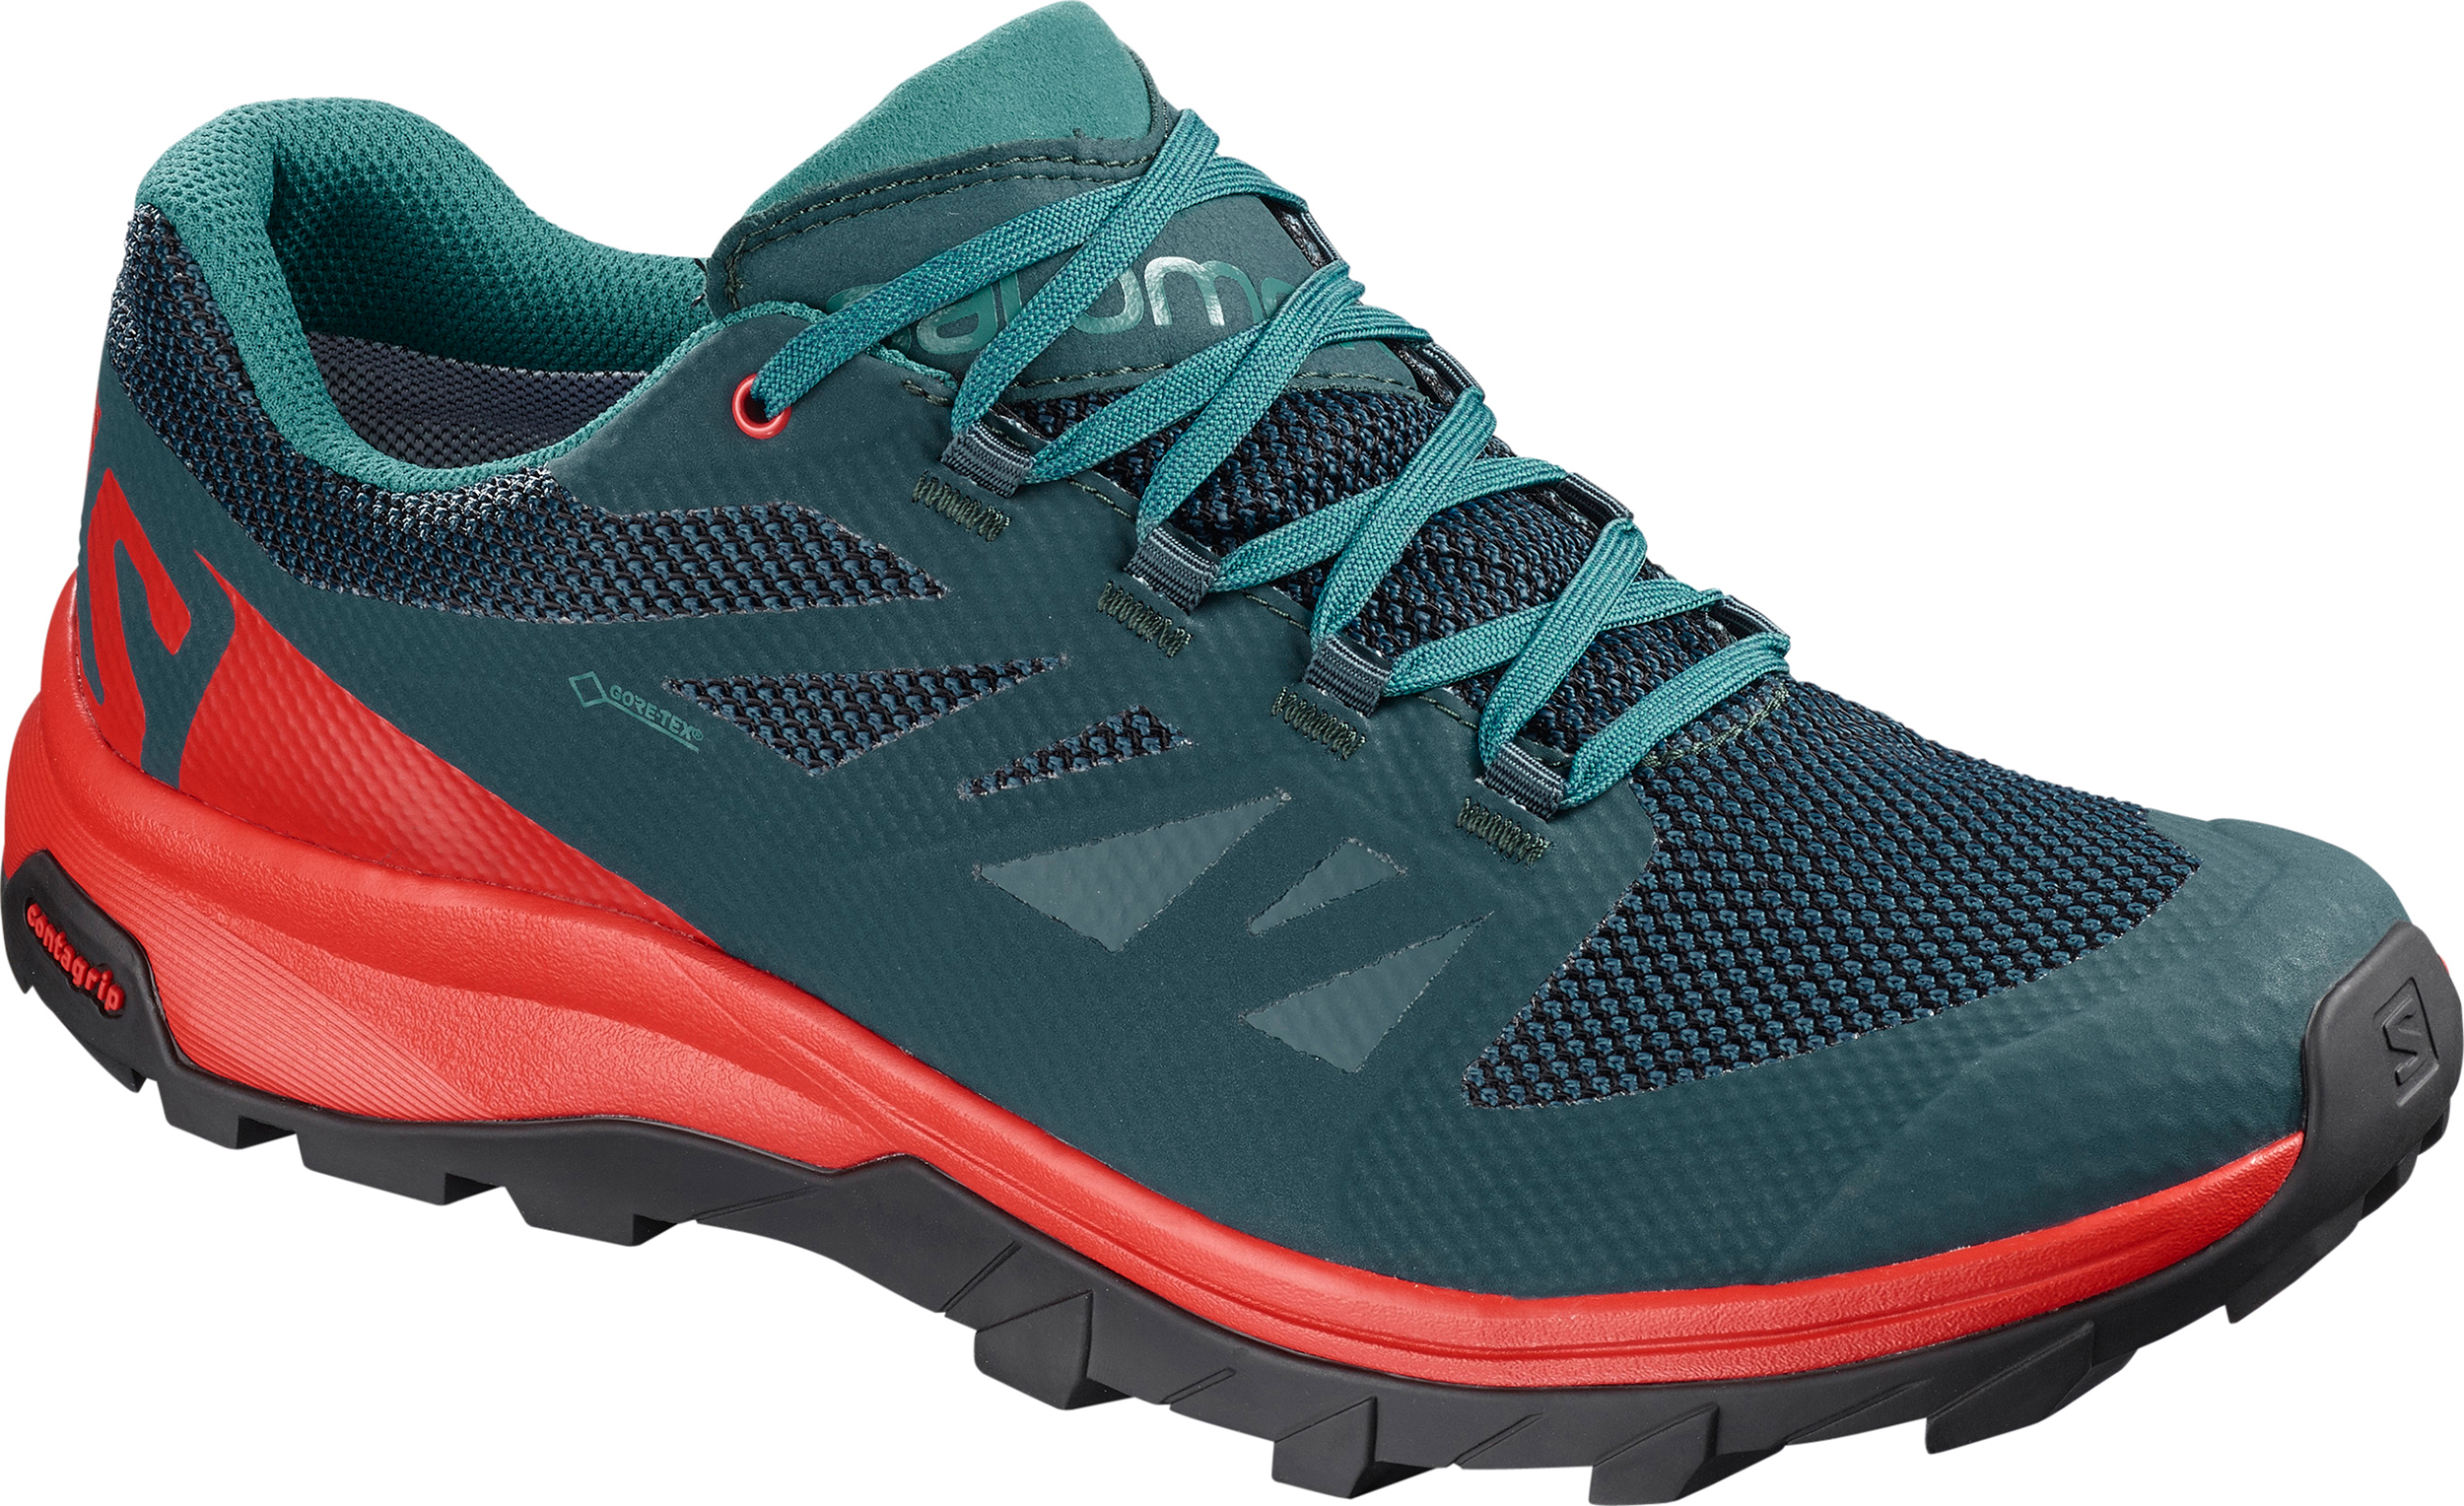 239fa62a57 Men s Hiking shoes